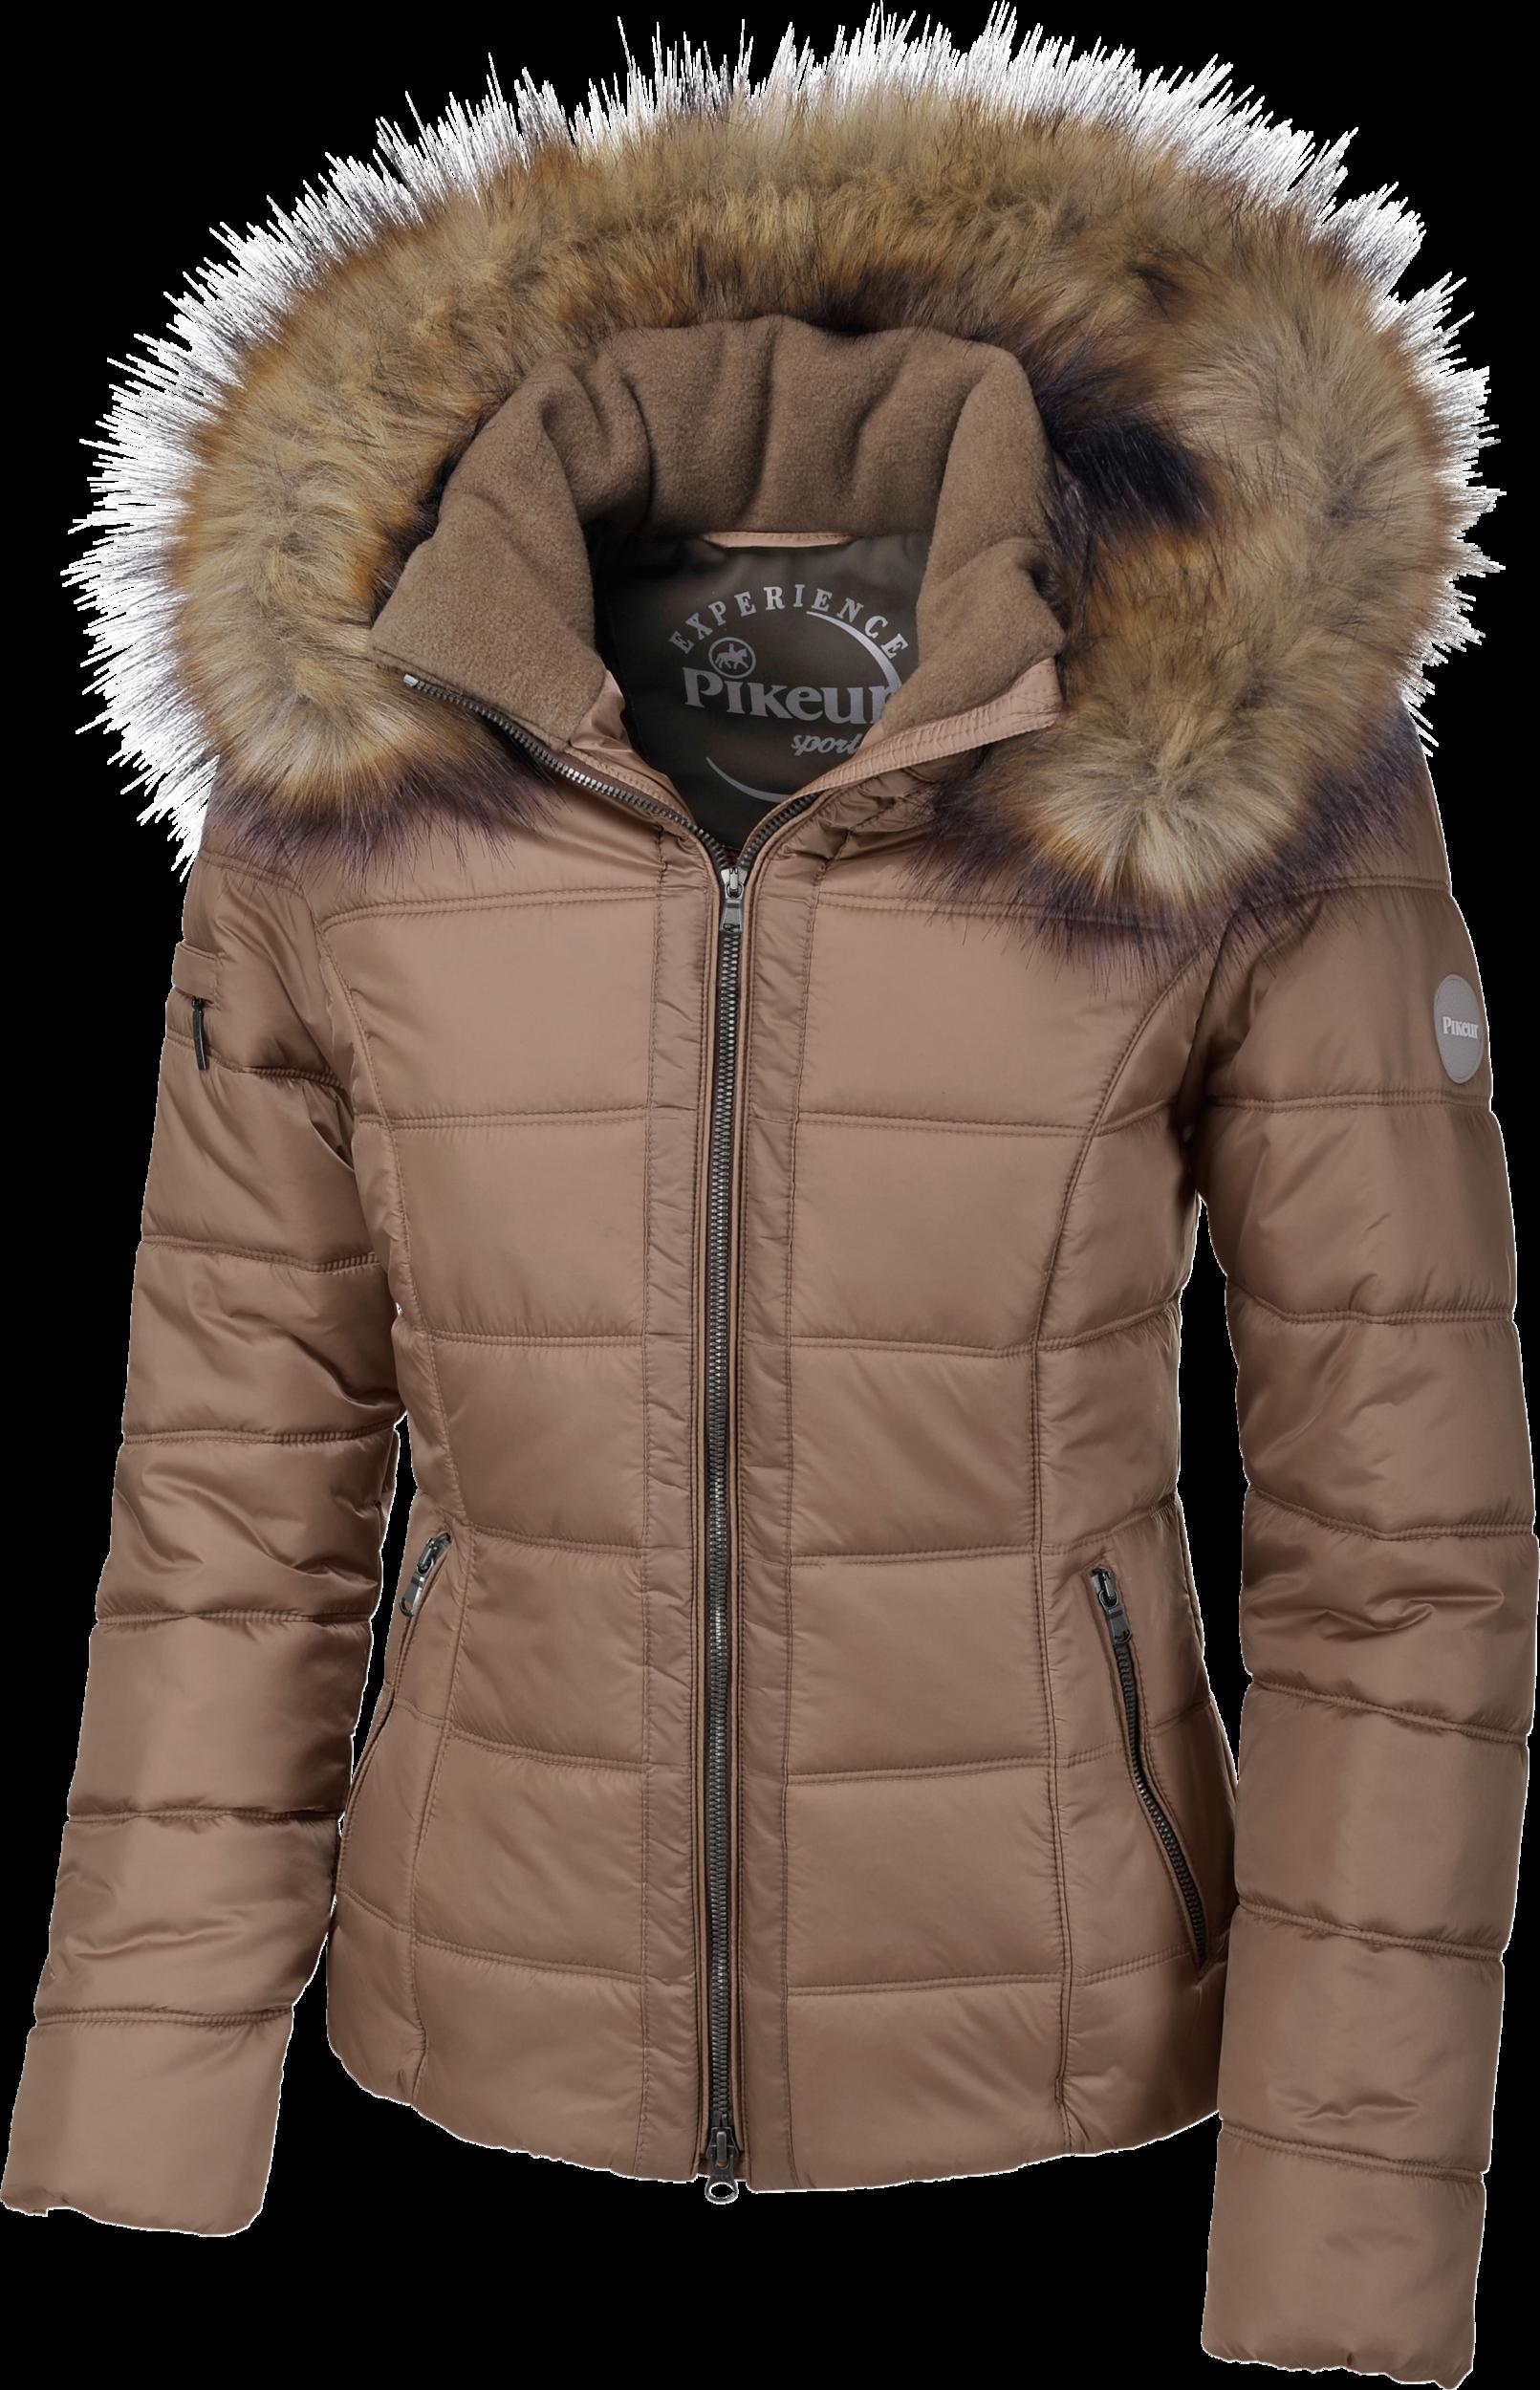 FLORENTINE Jacket